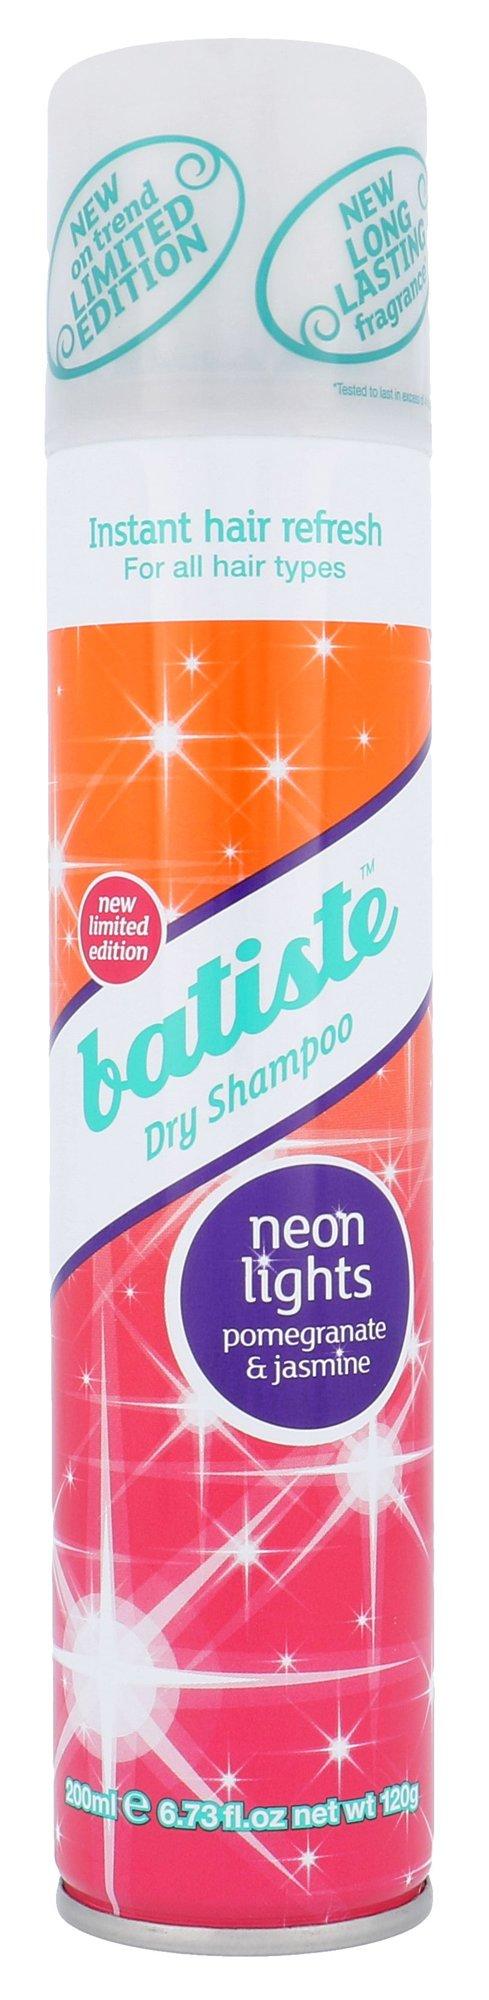 Batiste Neon Lights Cosmetic 200ml